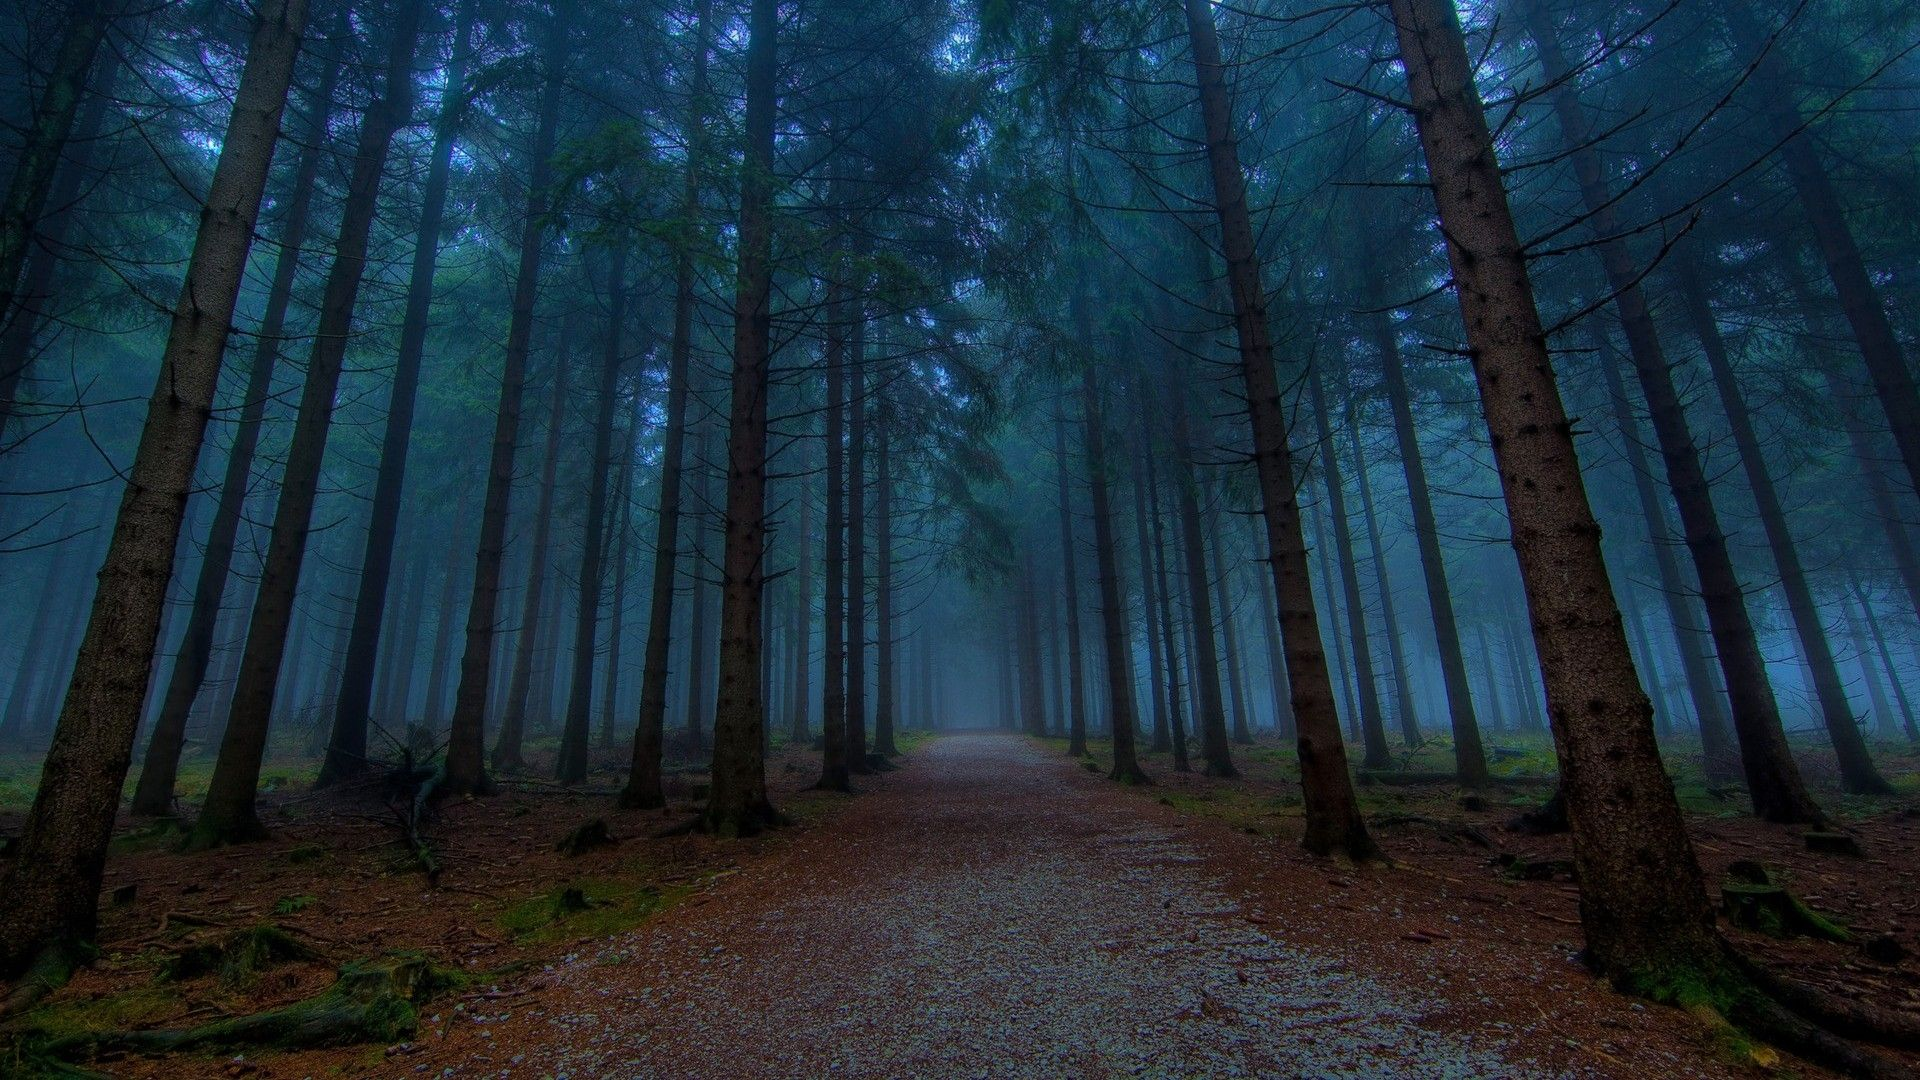 Woods Wallpaper Https Googledrive Com Host 0b0rtlvpnfm